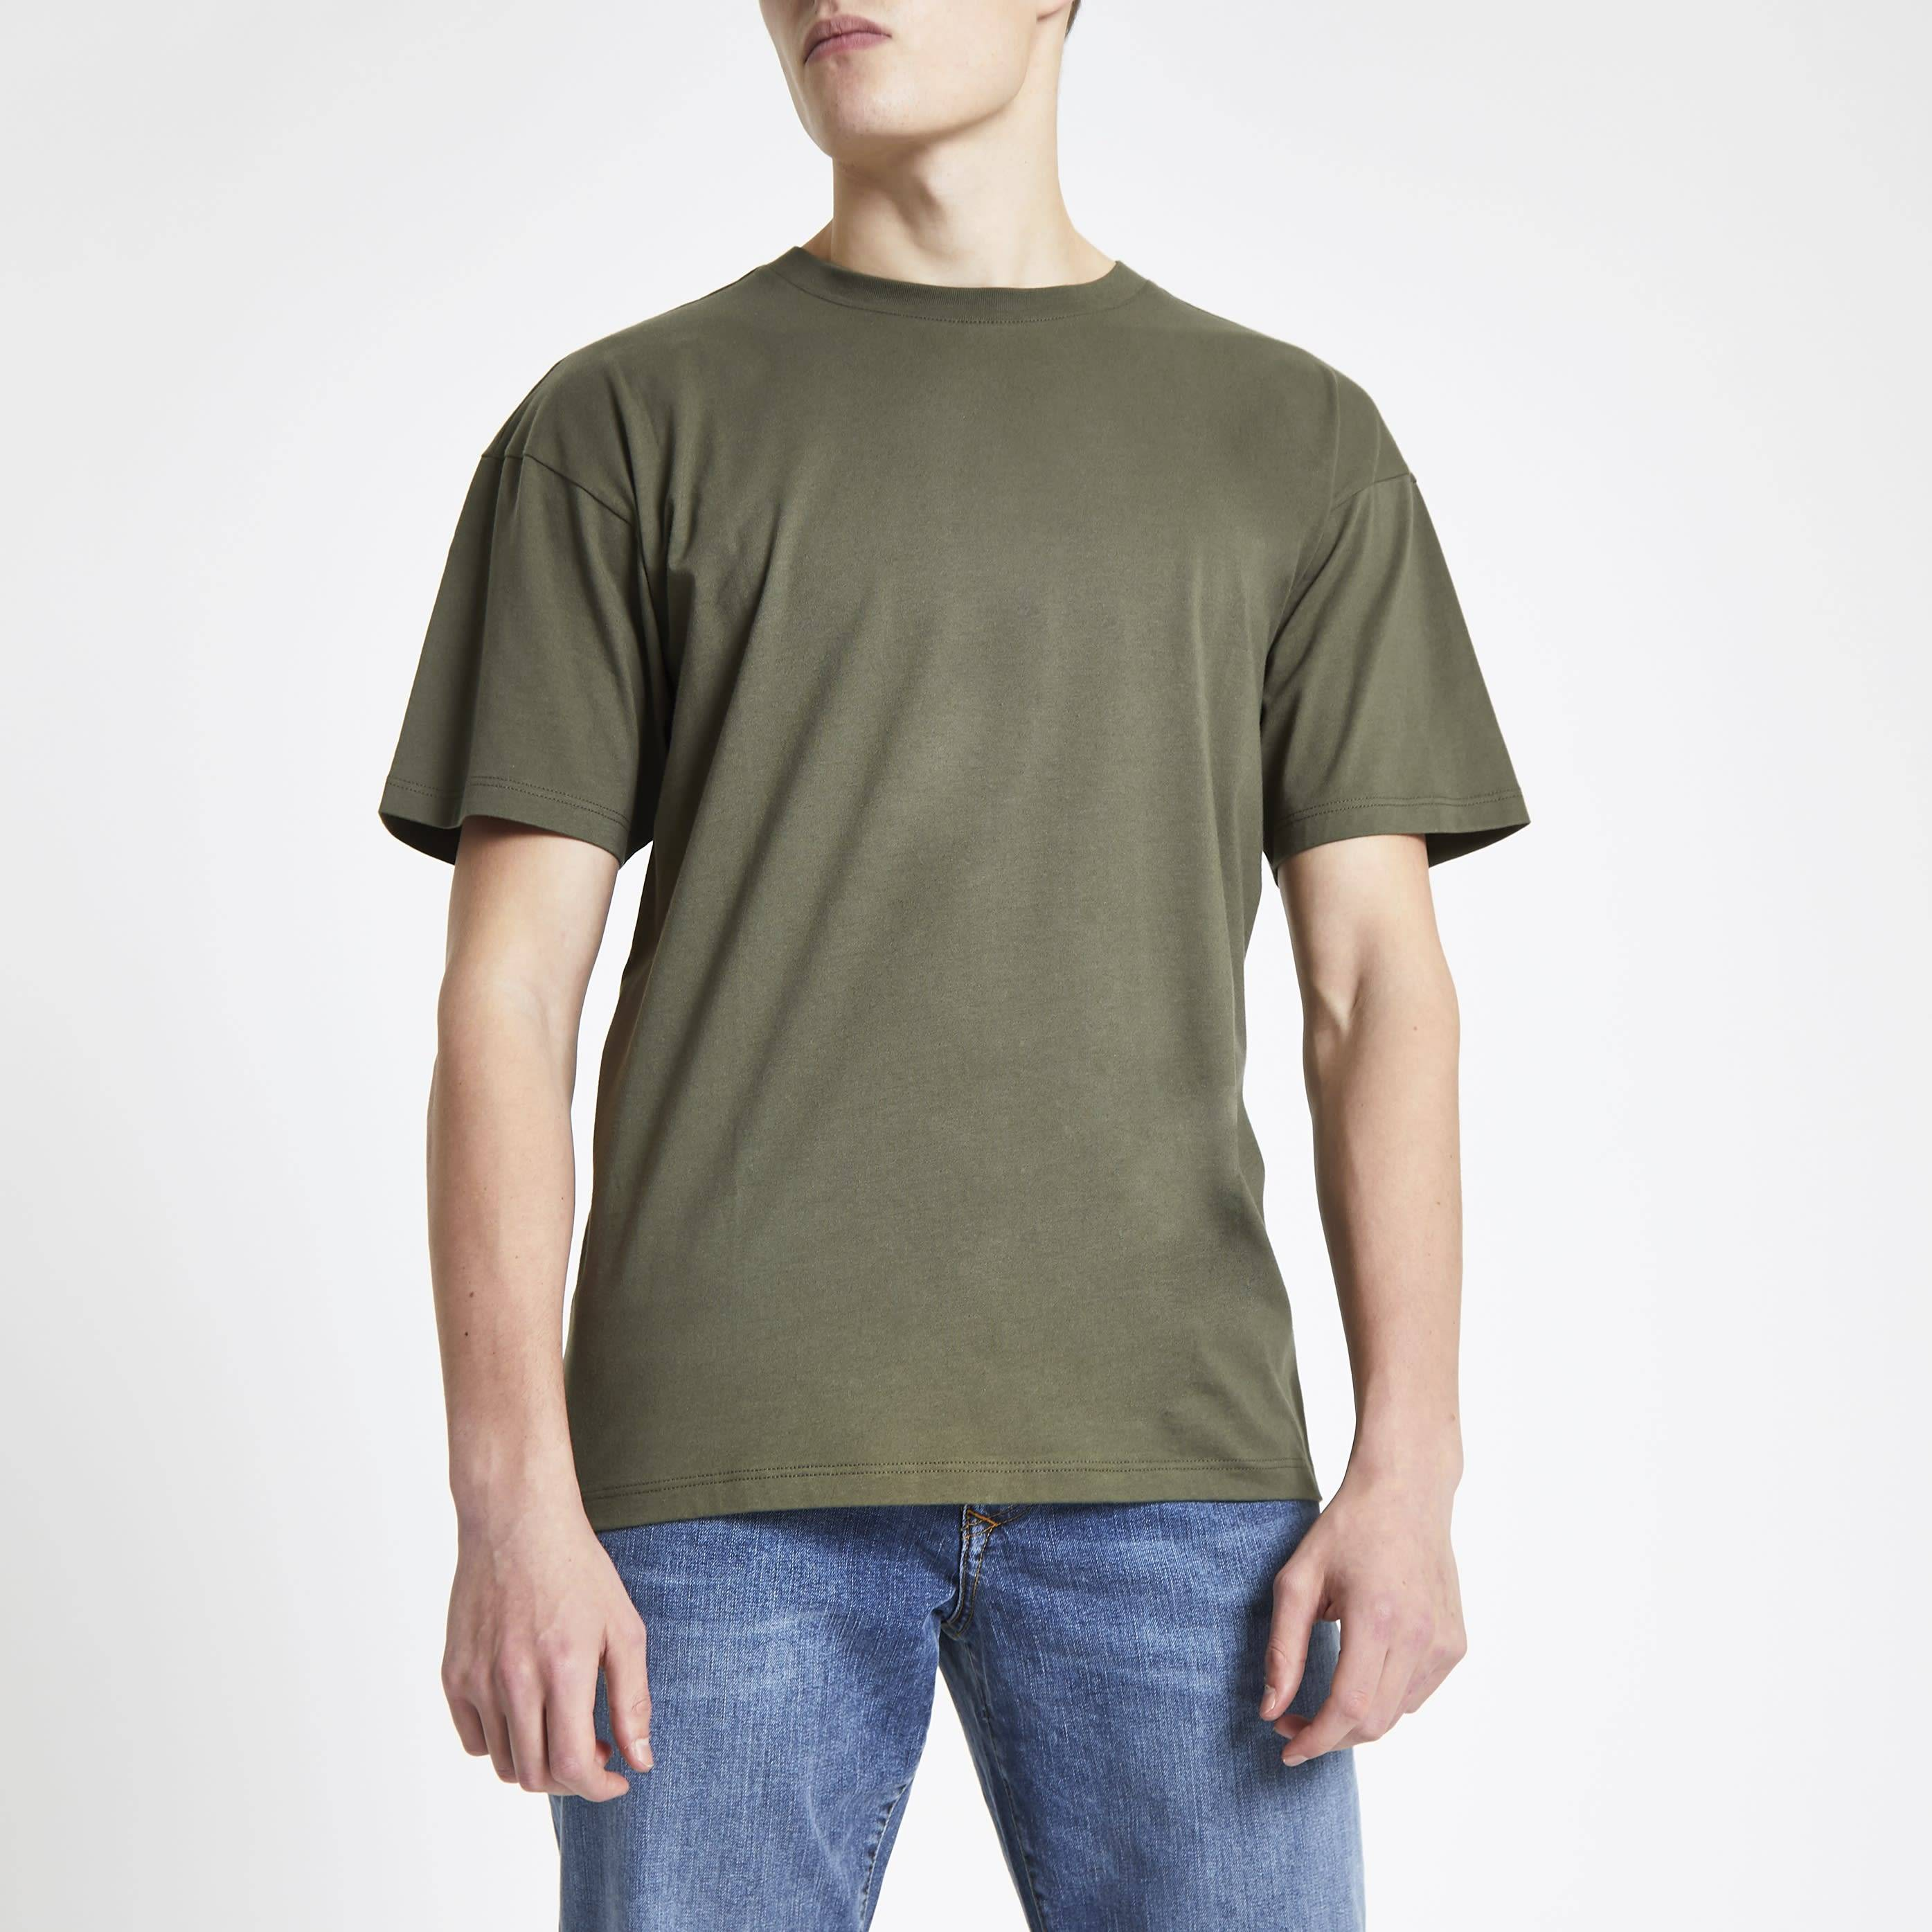 River Island Mens Green oversized short sleeve T-shirt (M)